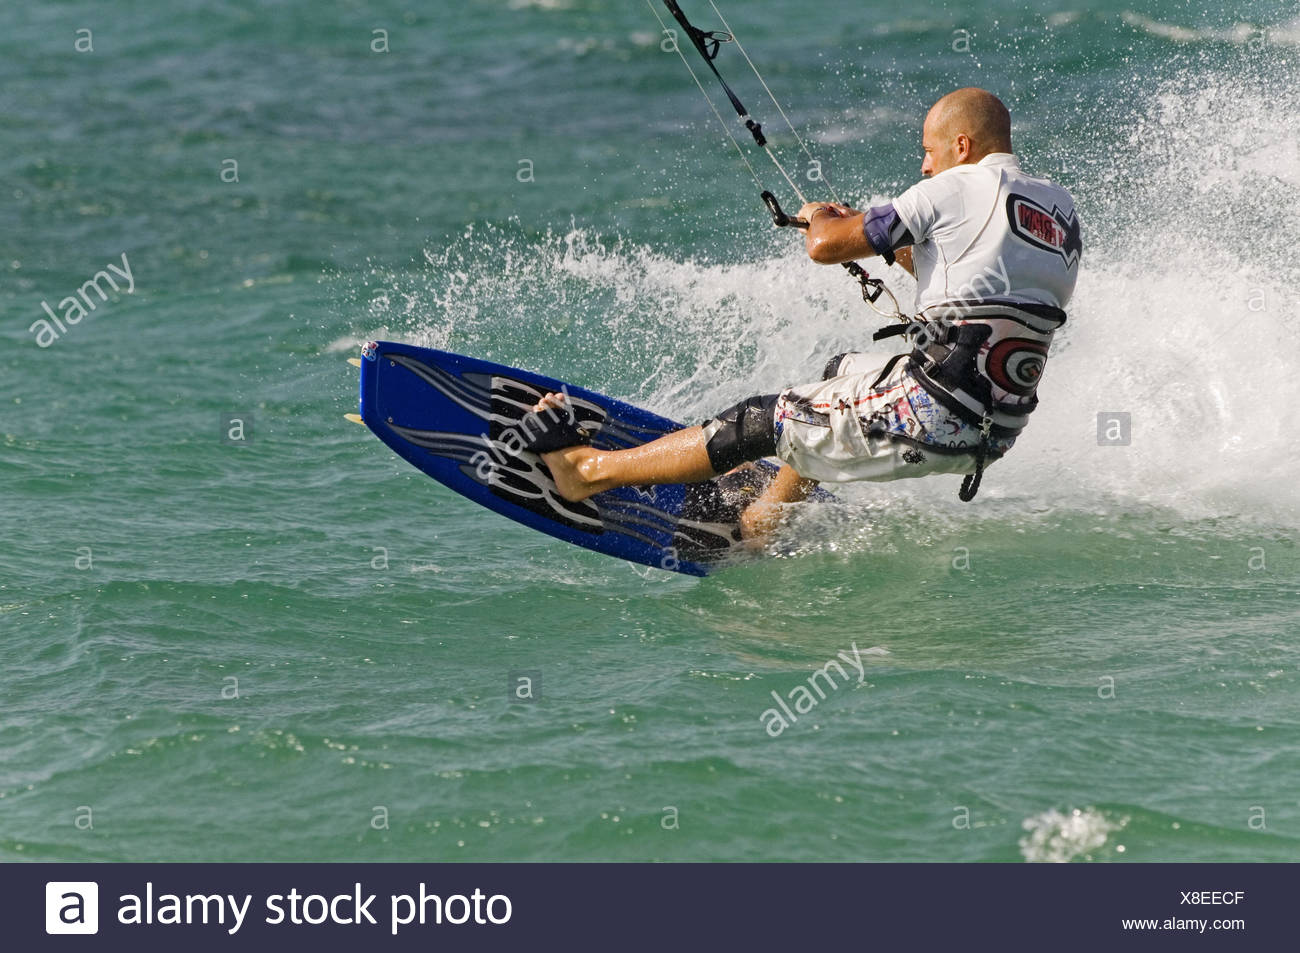 kite surfing in tarifa - Stock Image